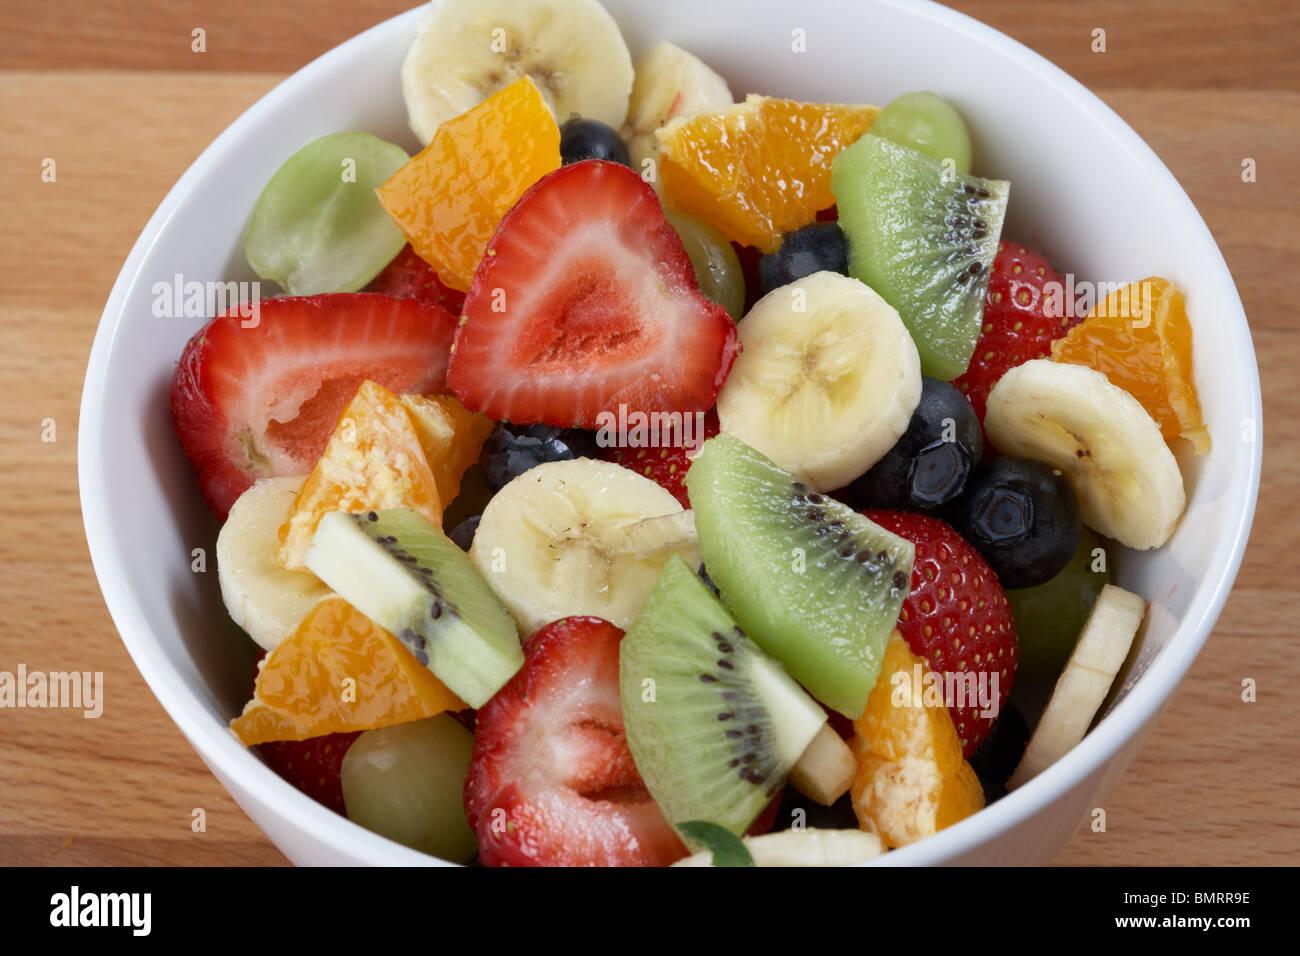 Natural Goodness Food